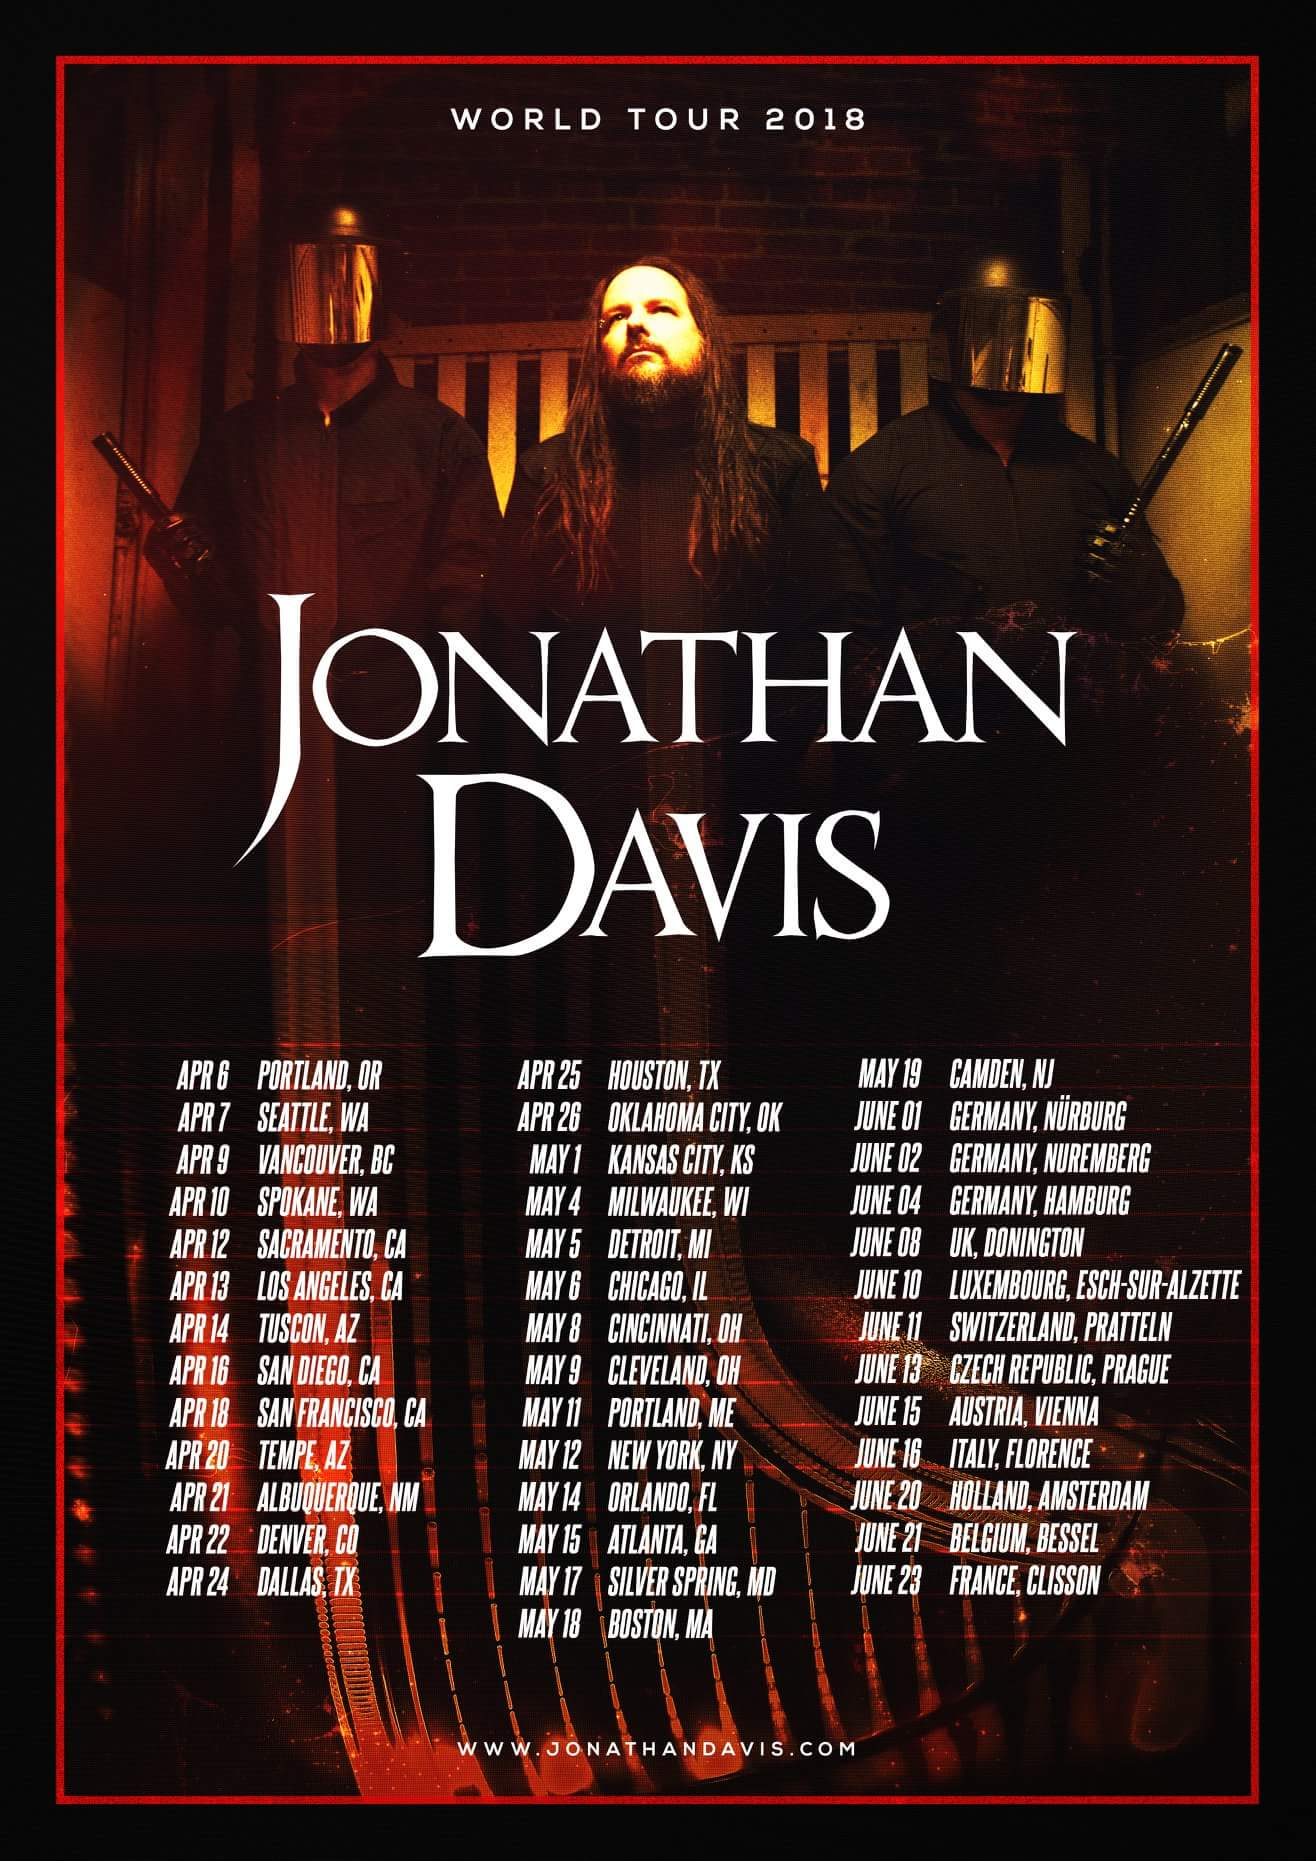 Korn 22 Heavy Metal Music Legend Star California Band Poster Jonathan Davis